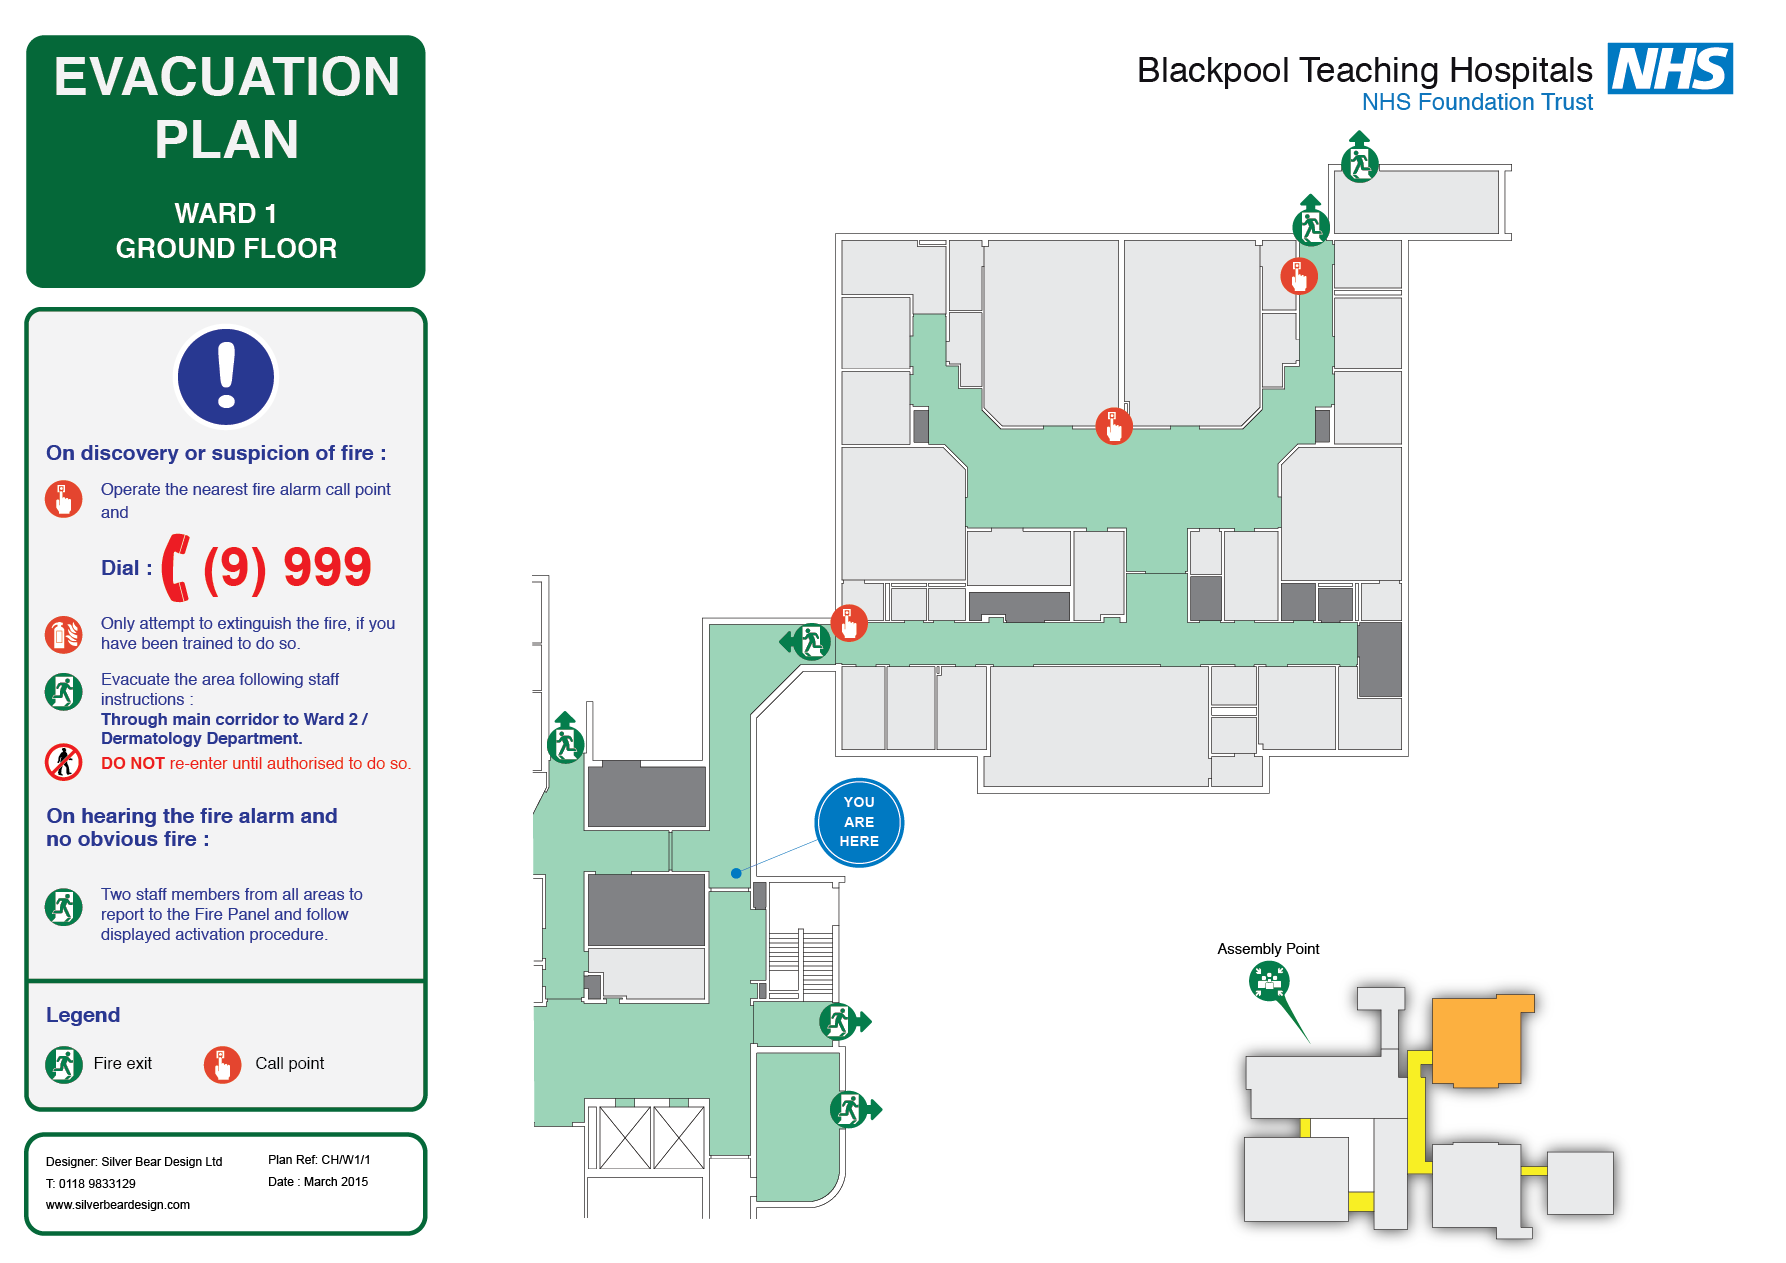 Nhs fire evacuation plan fire evacuation plans pinterest nhs fire evacuation plan biocorpaavc Gallery